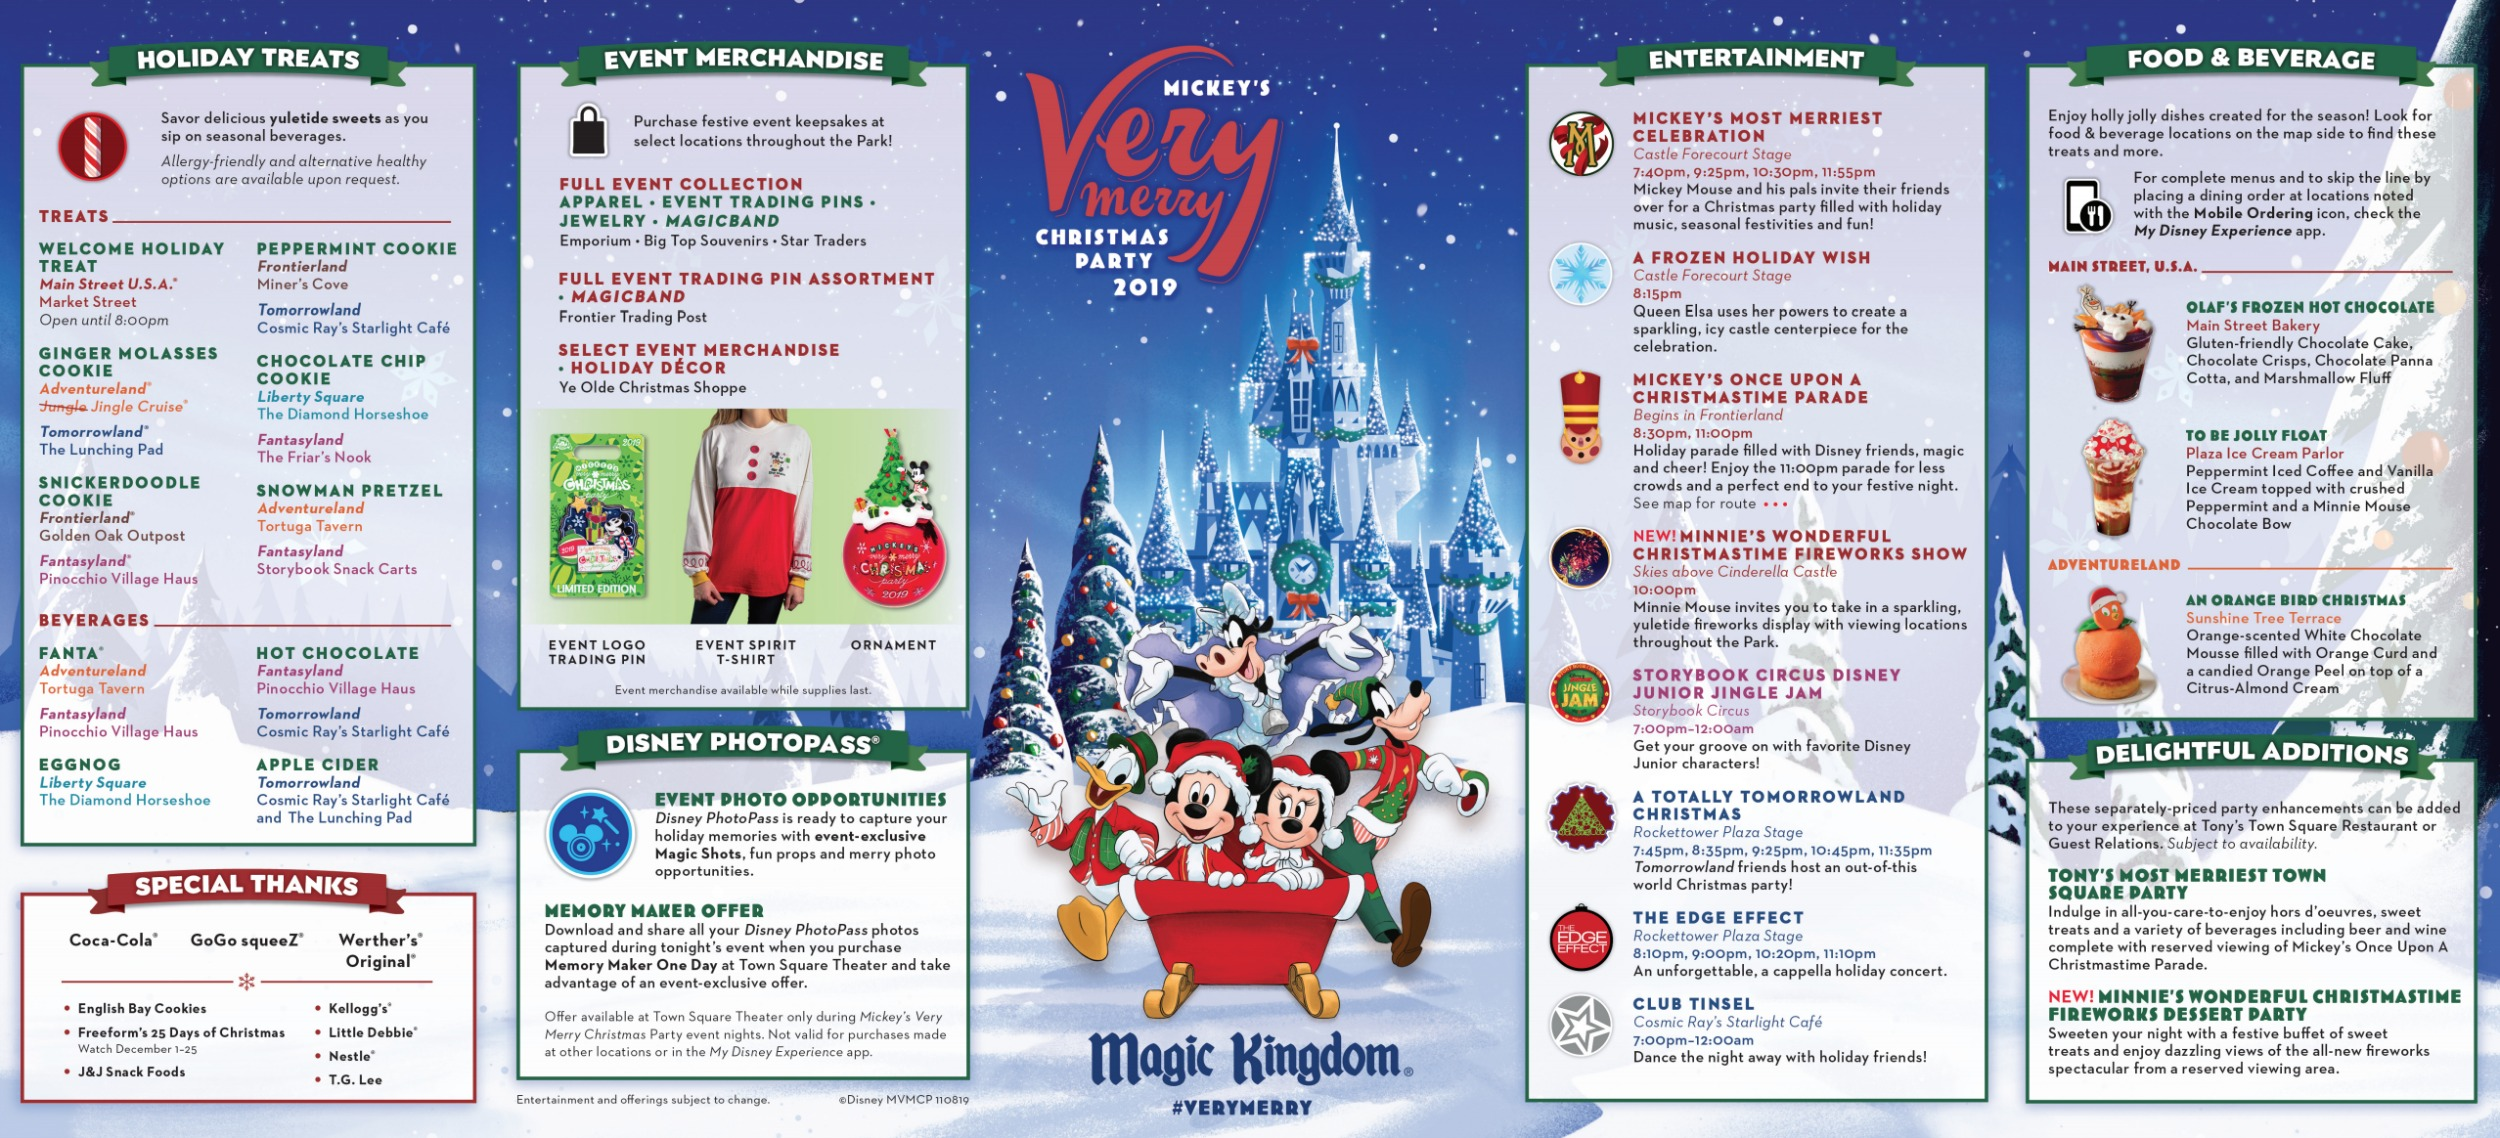 Mickeys Very Merry Christmas Party 2021 Brochure Mickey S Very Merry Christmas Party Map 2019 Walt Disney World